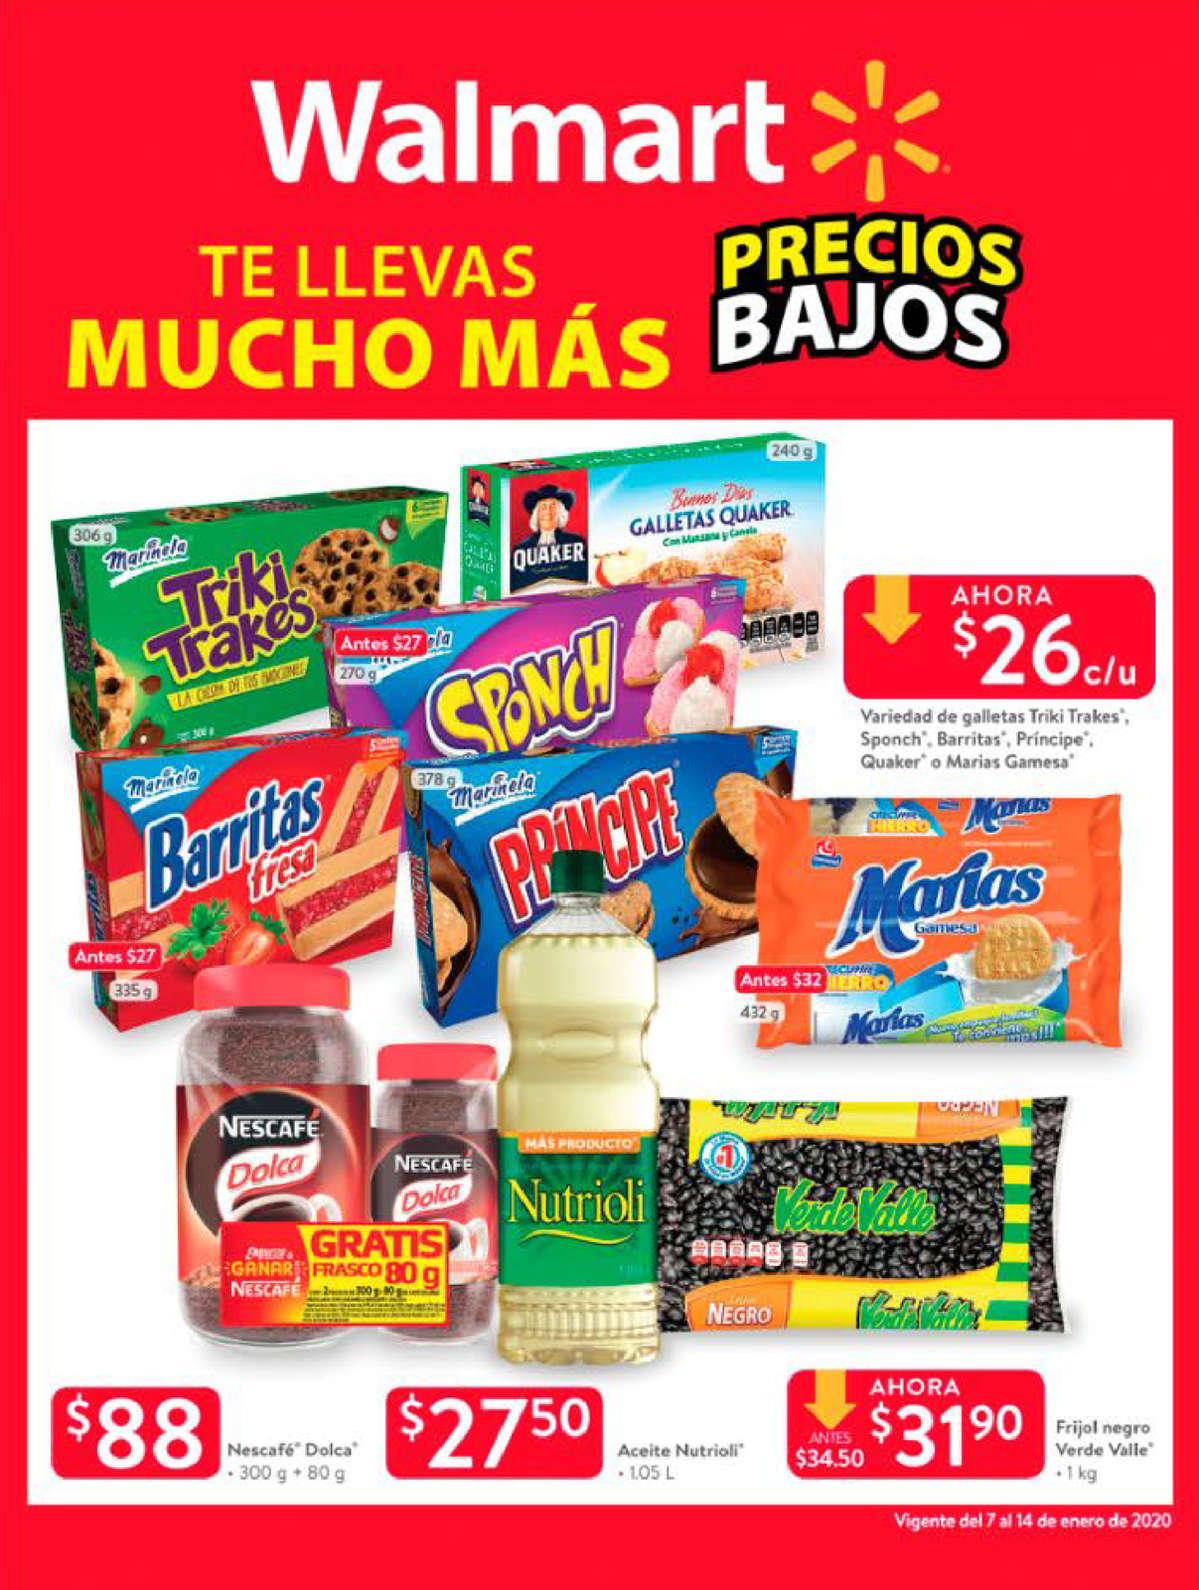 Walmart Folleto - 07.01-14.01.2020